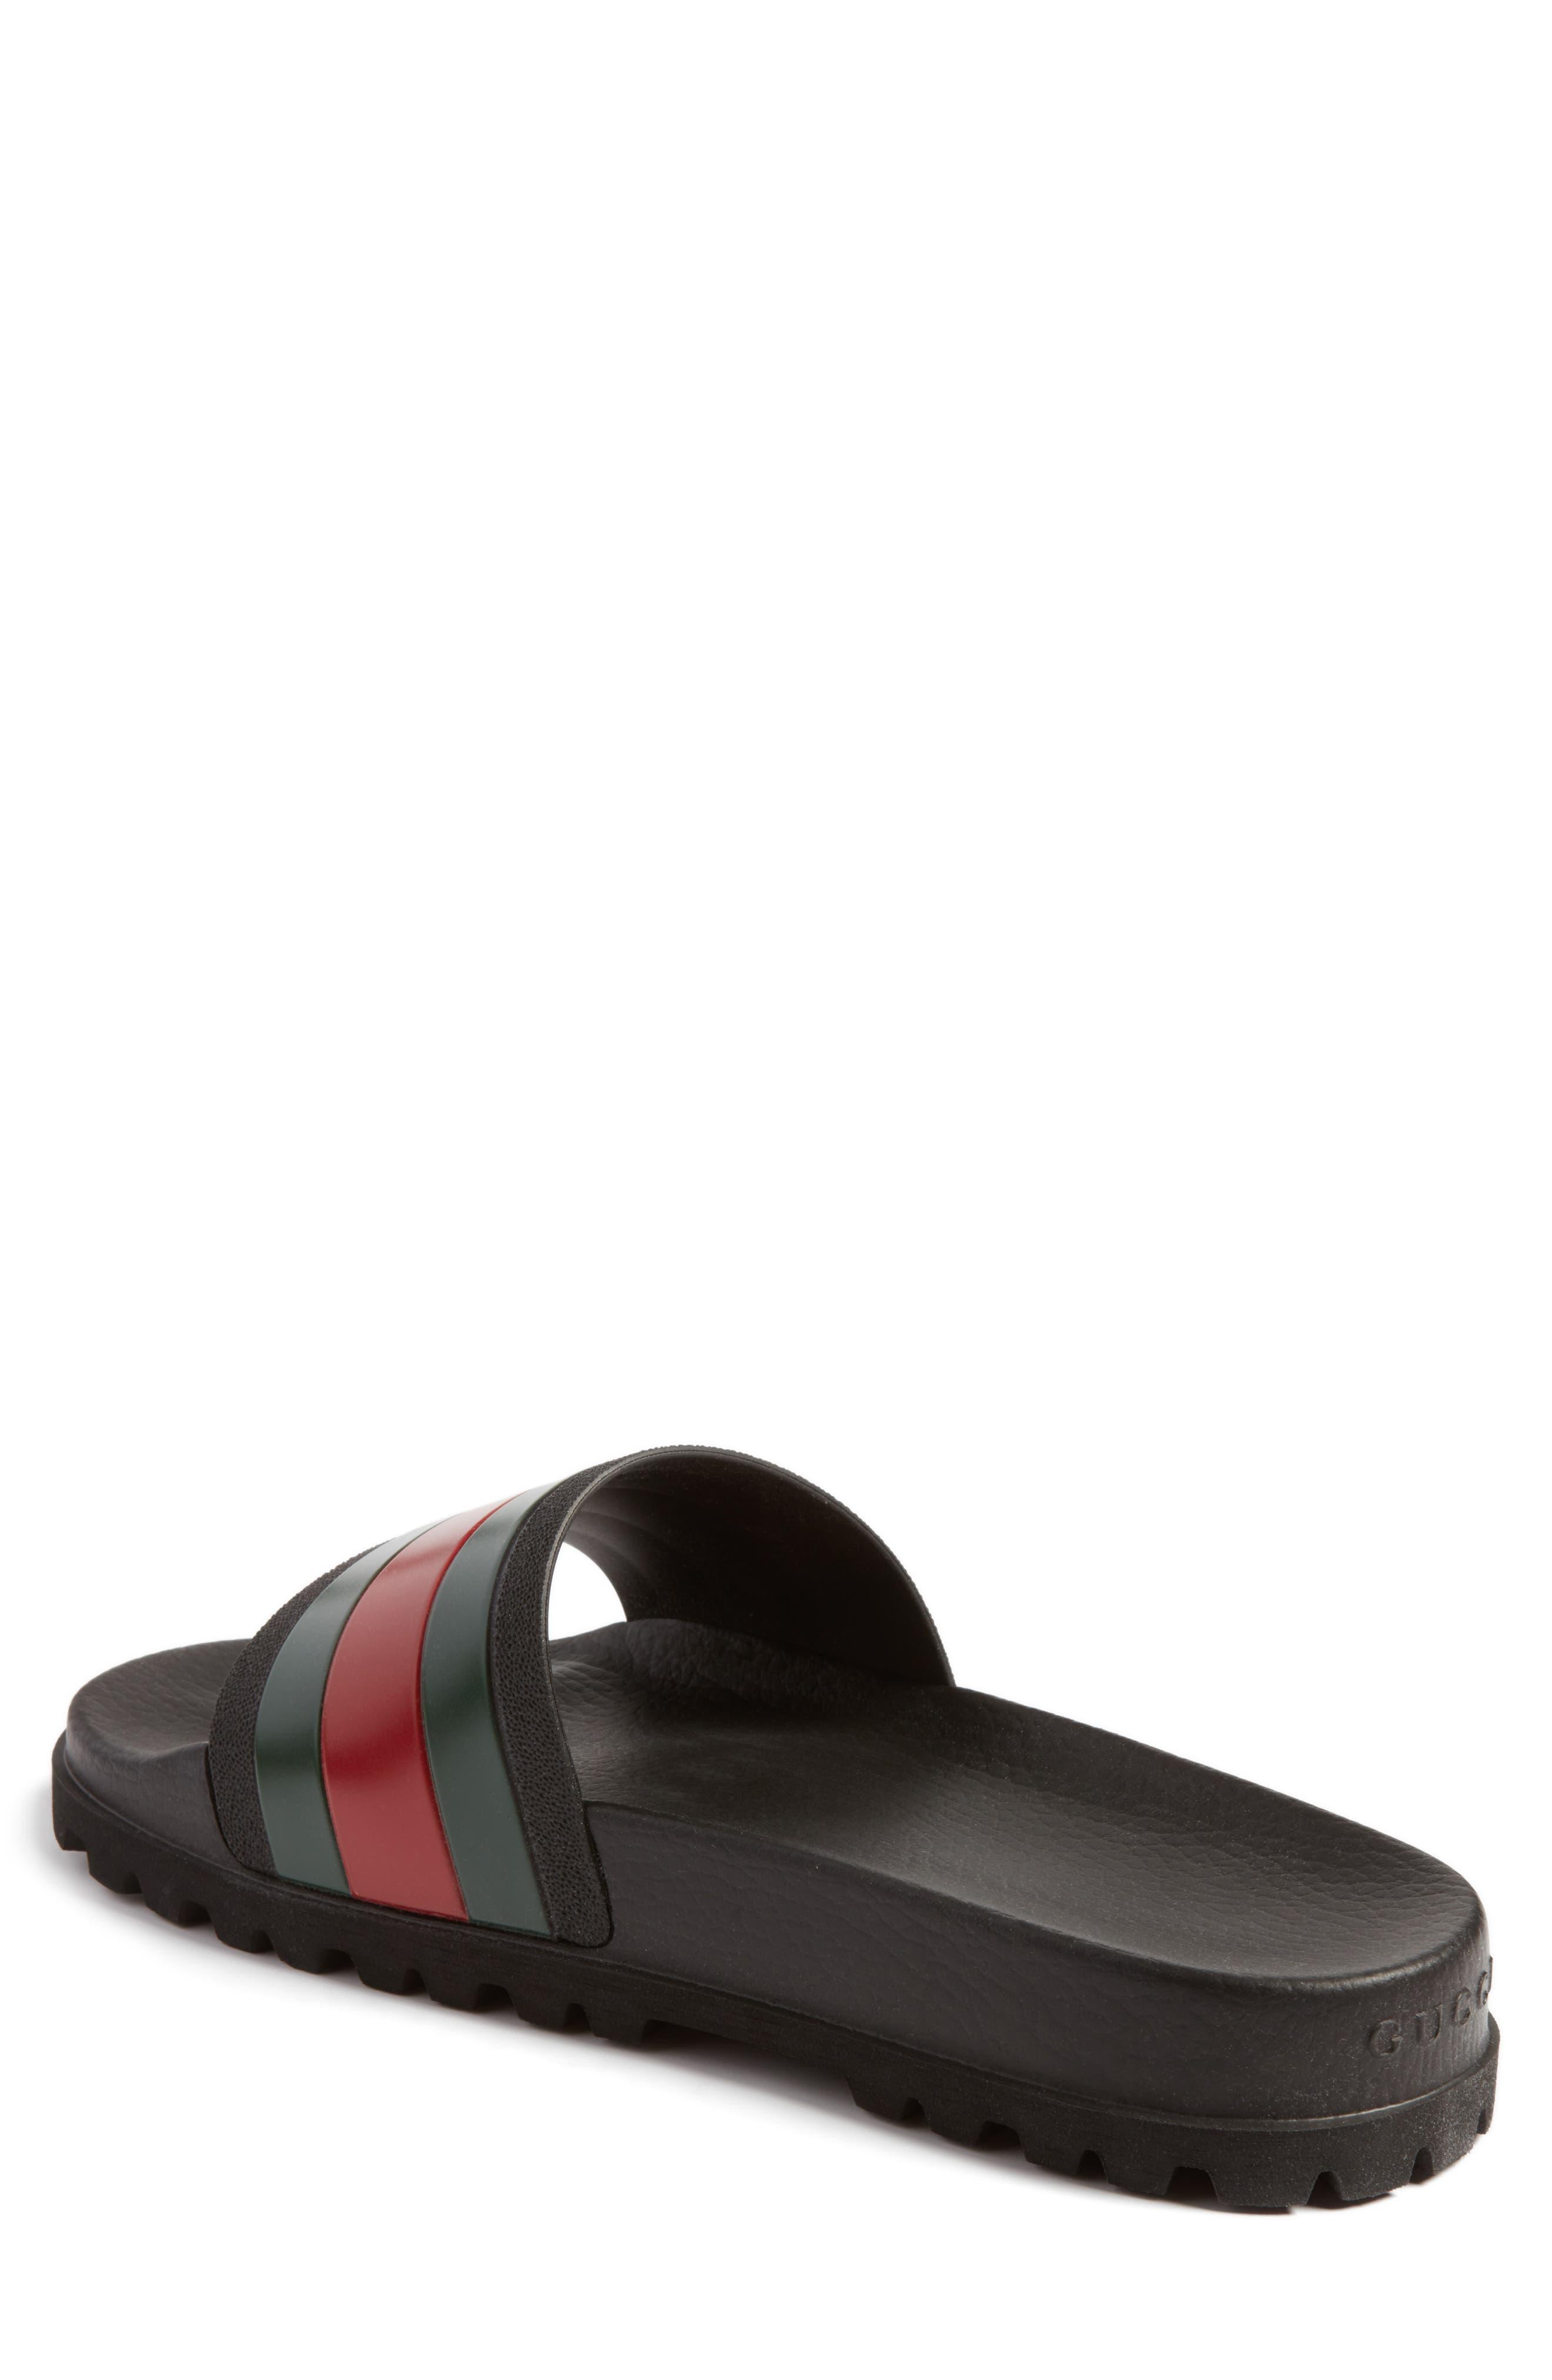 GUCCI, 'Pursuit Treck' Slide Sandal, Alternate thumbnail 2, color, NERO/NERO